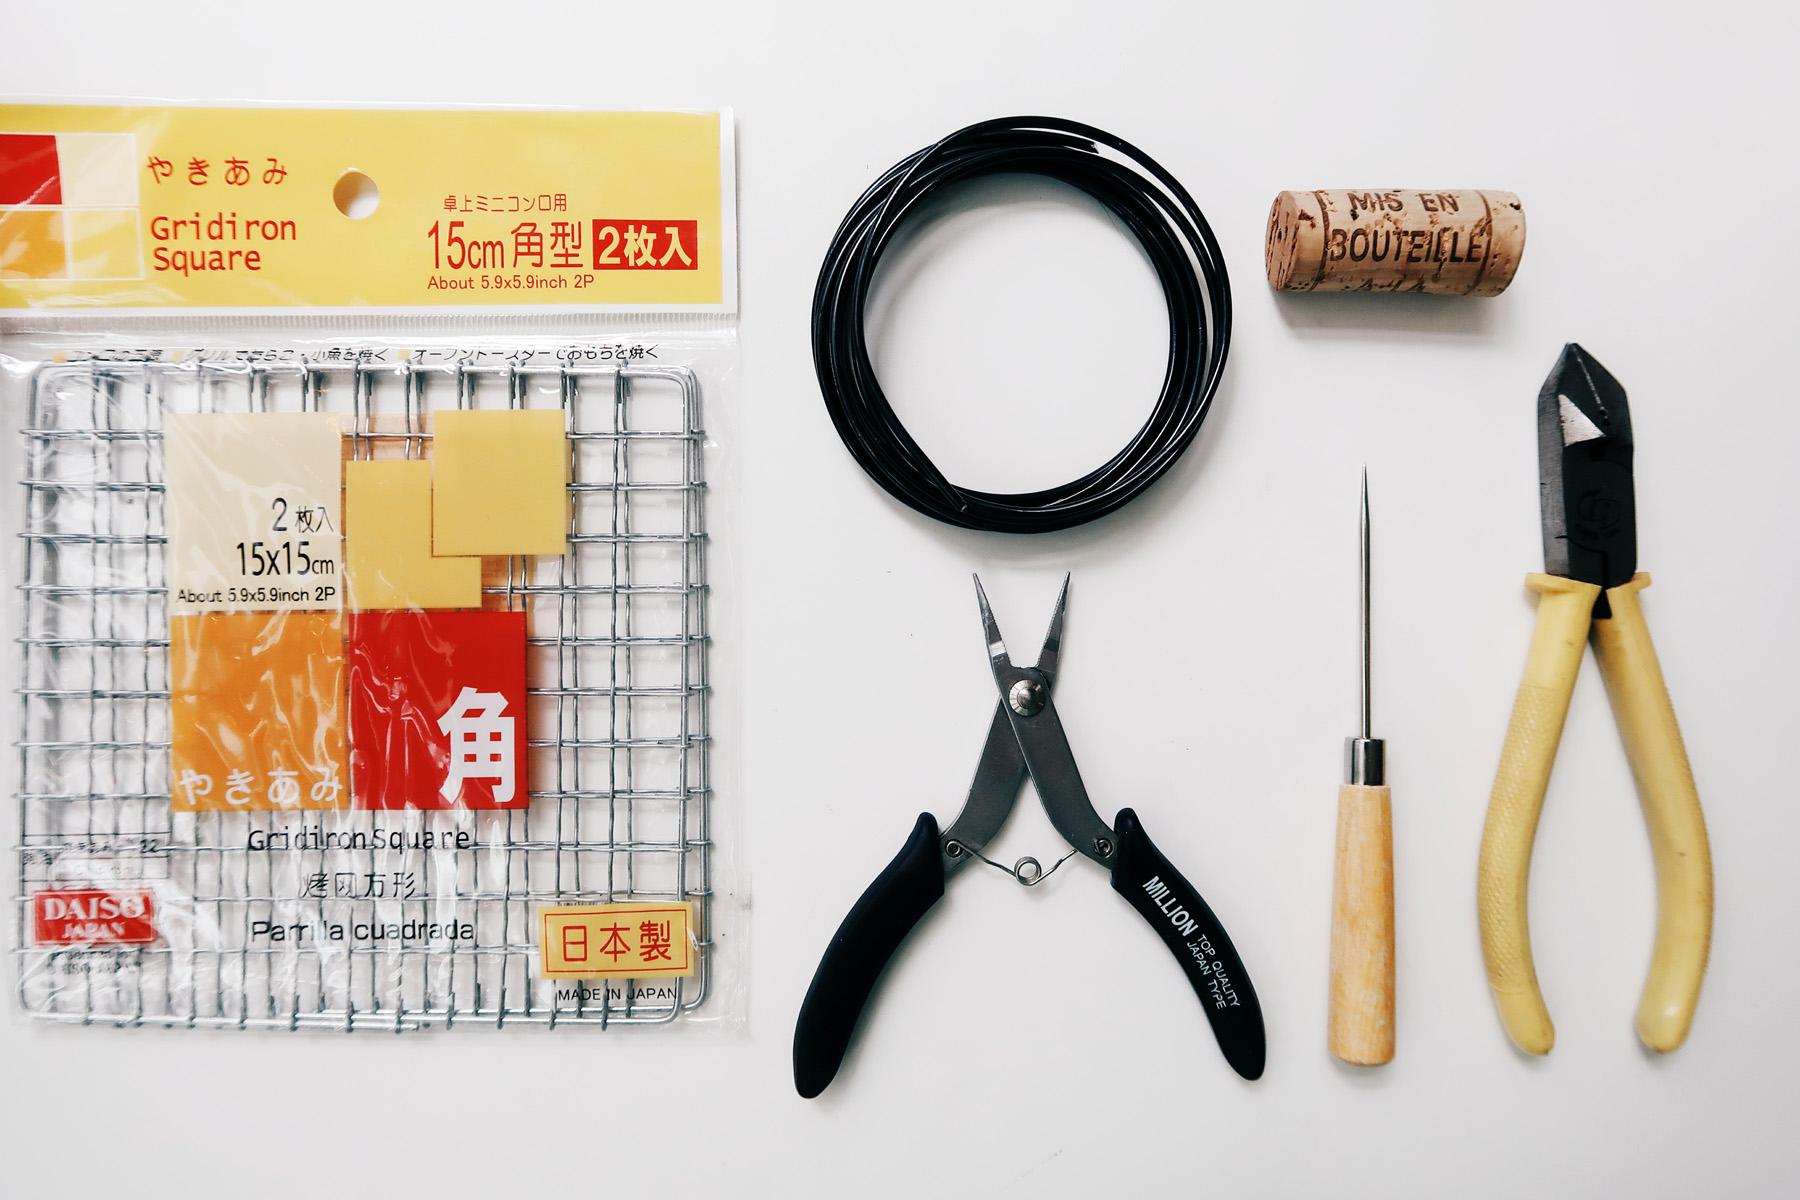 DIY 收納擺飾小黑鐵籃:Sept 1